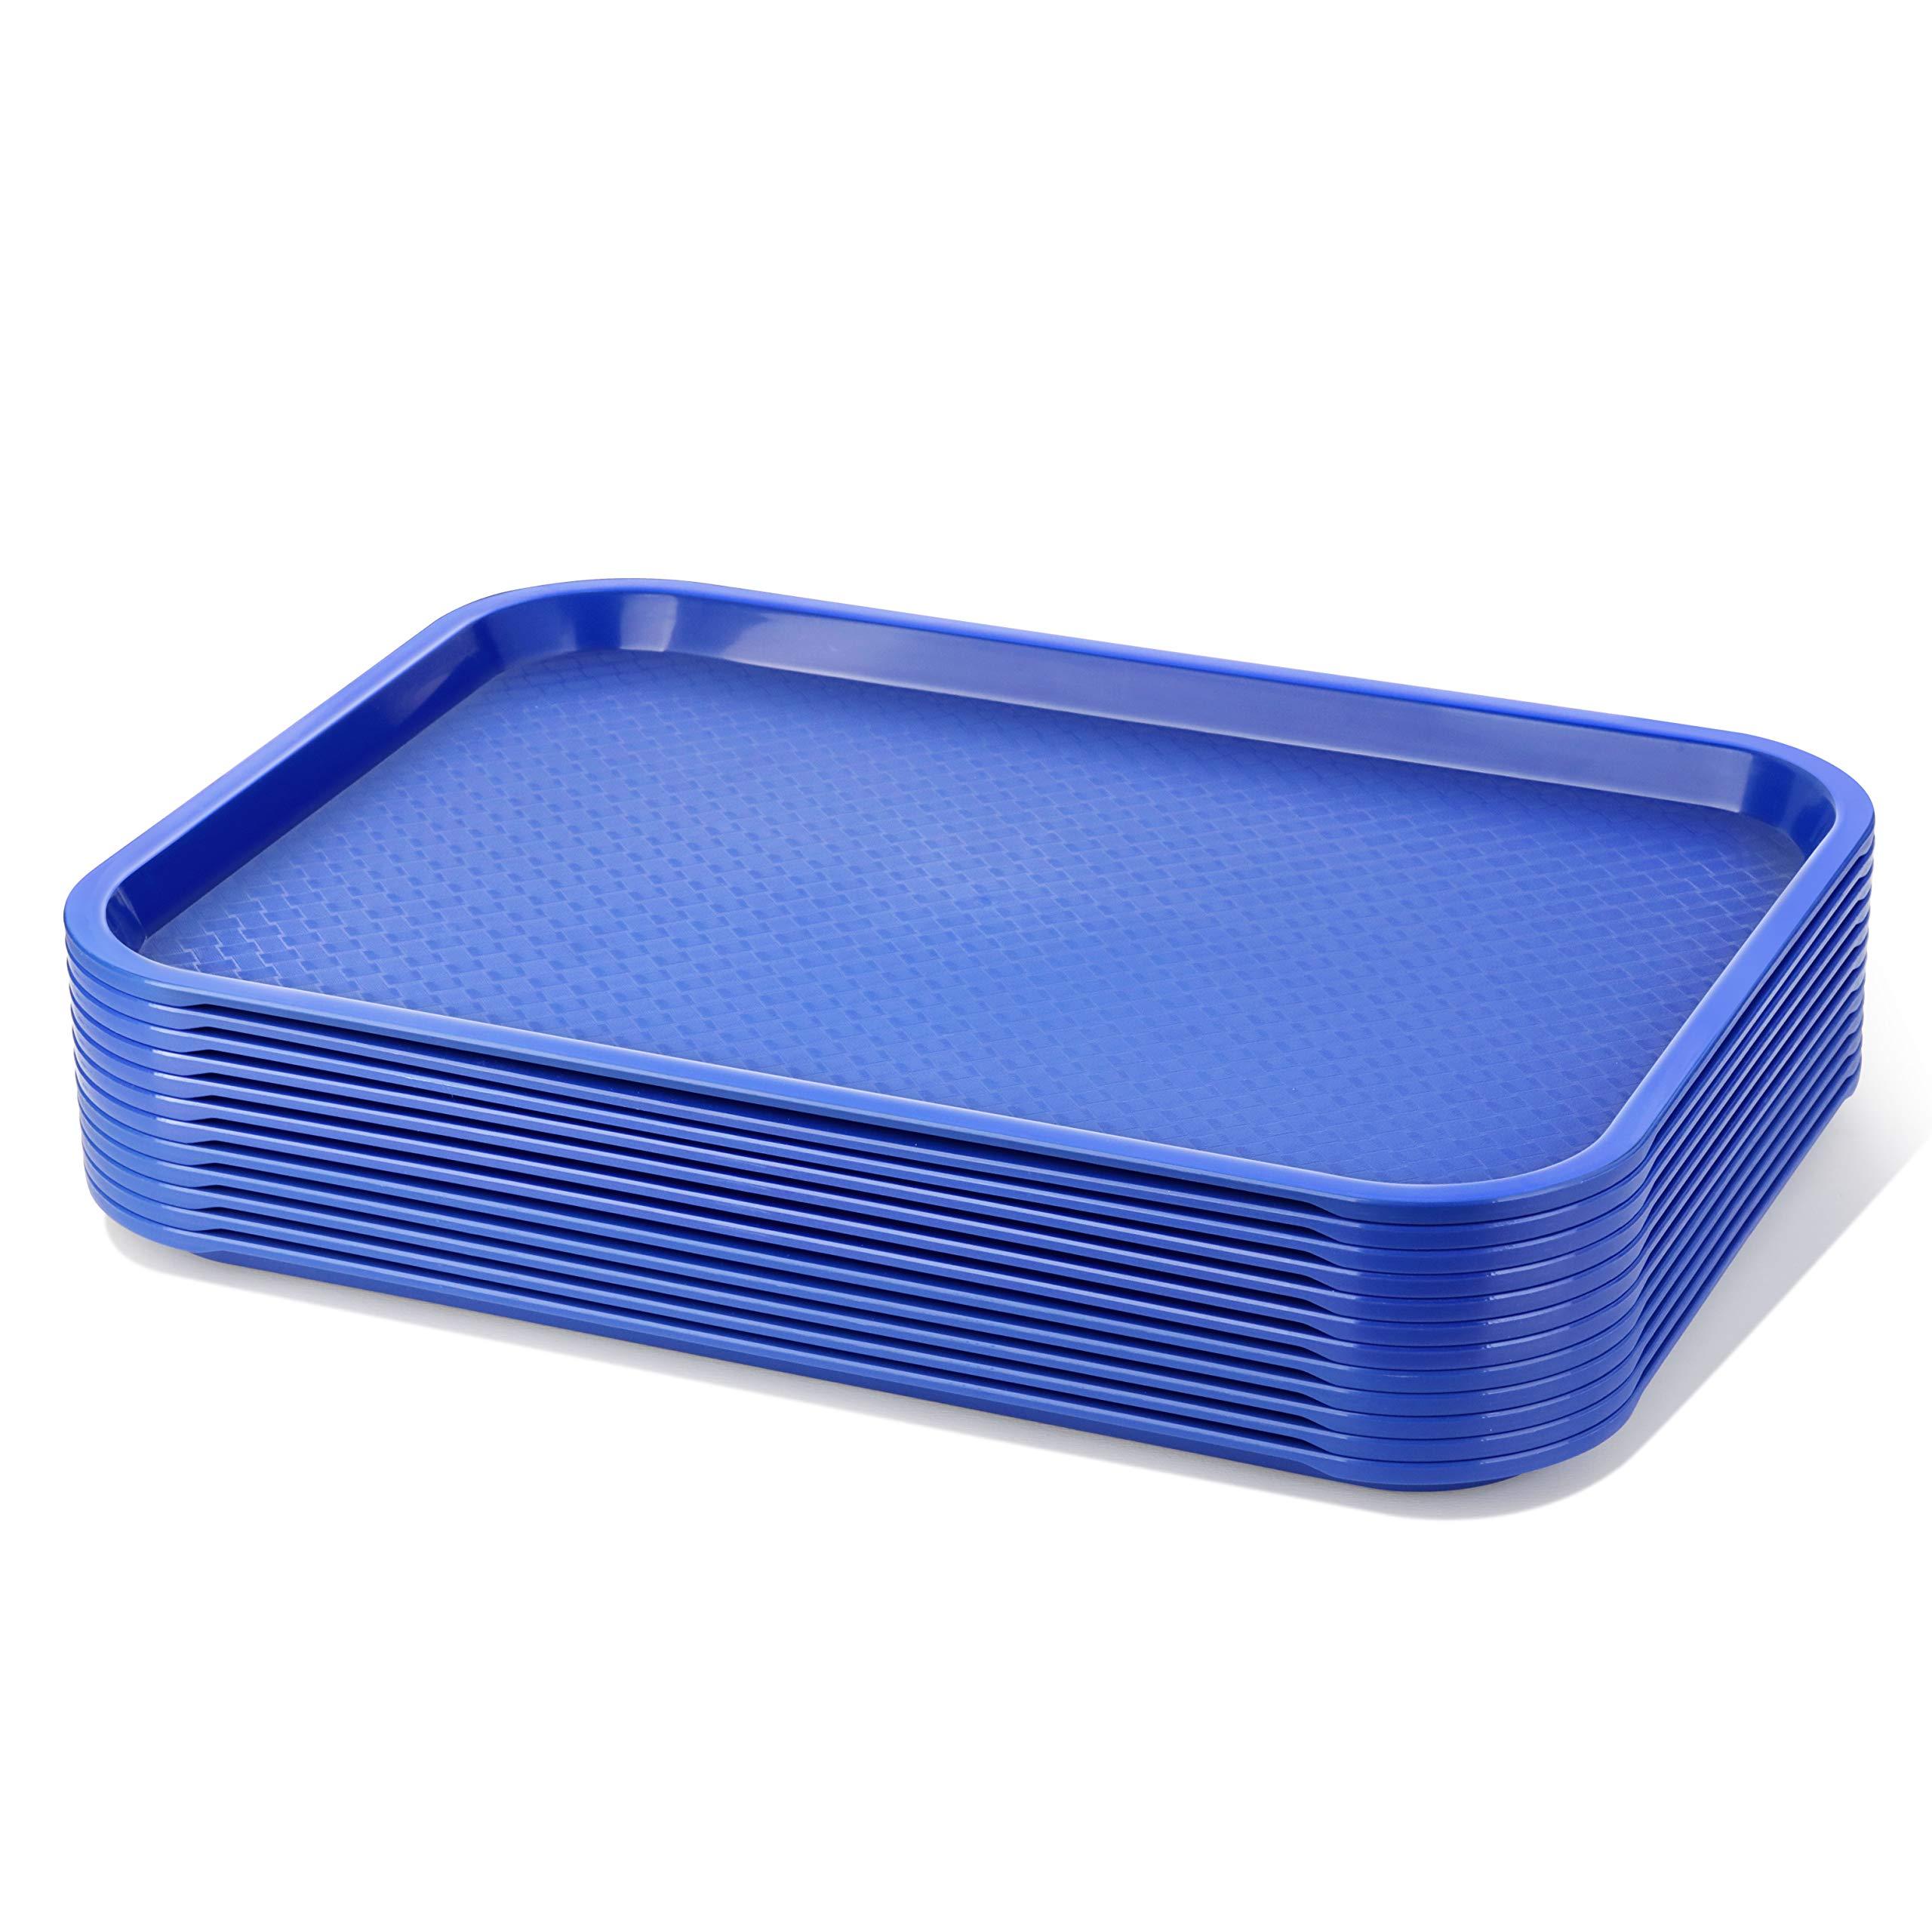 New Star Foodservice 24548 Plastic Fast Food Tray, Set of 12 , 12 by 16-Inch, Blue by New Star Foodservice